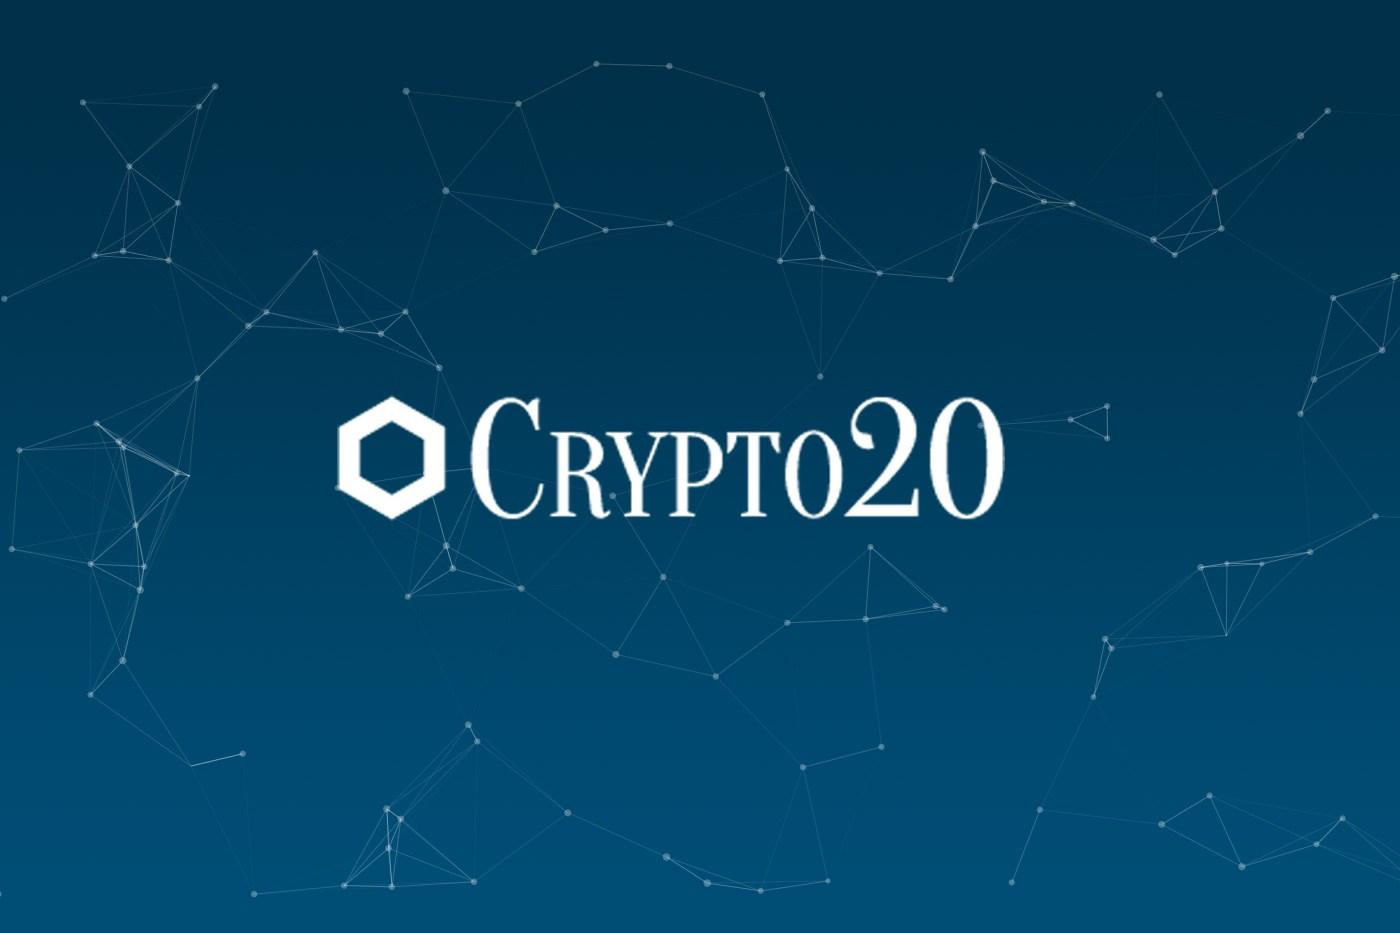 CRYPTO20 ICO